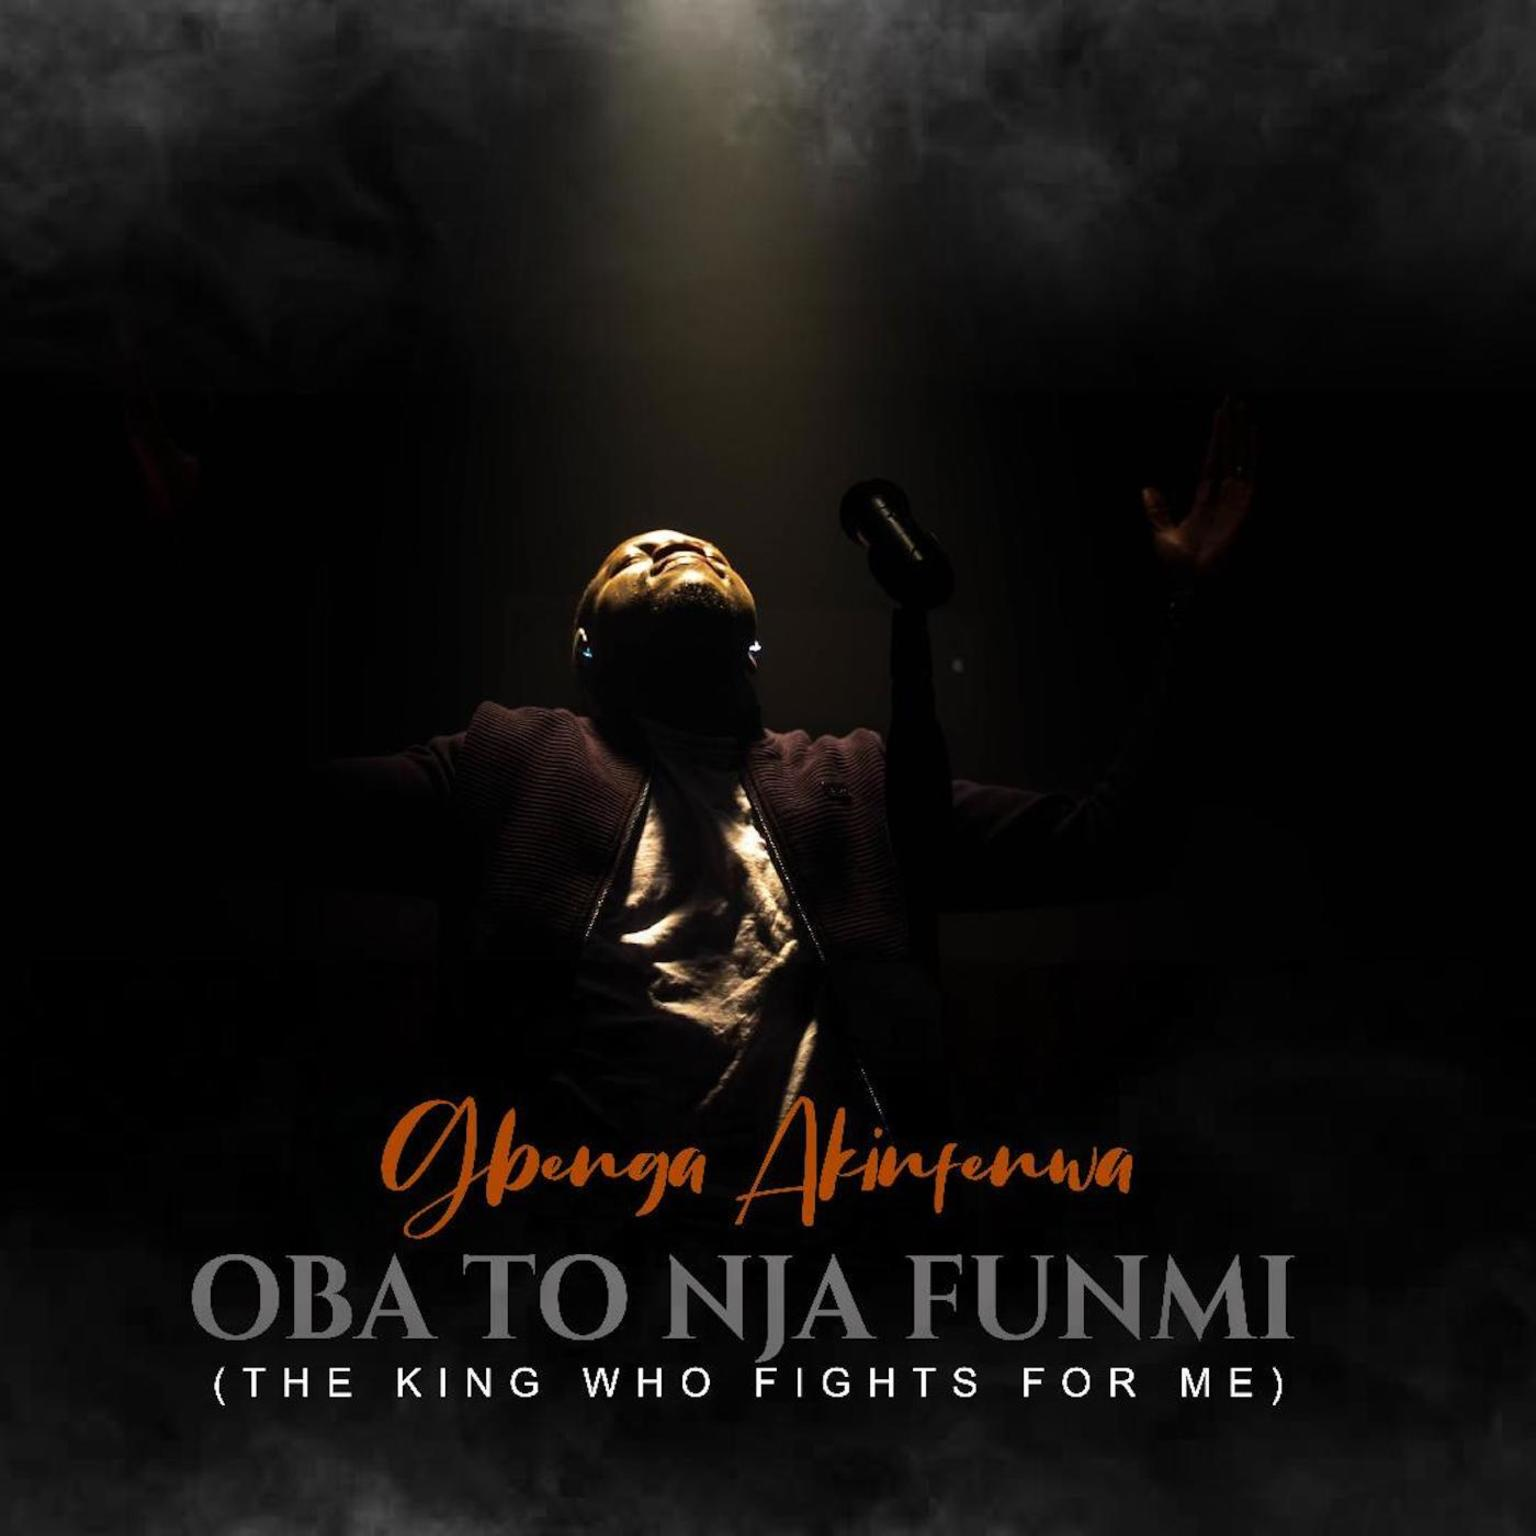 Gbenga Akinfenwa - Oba To Nja Funmi (The King who Fights for Me)